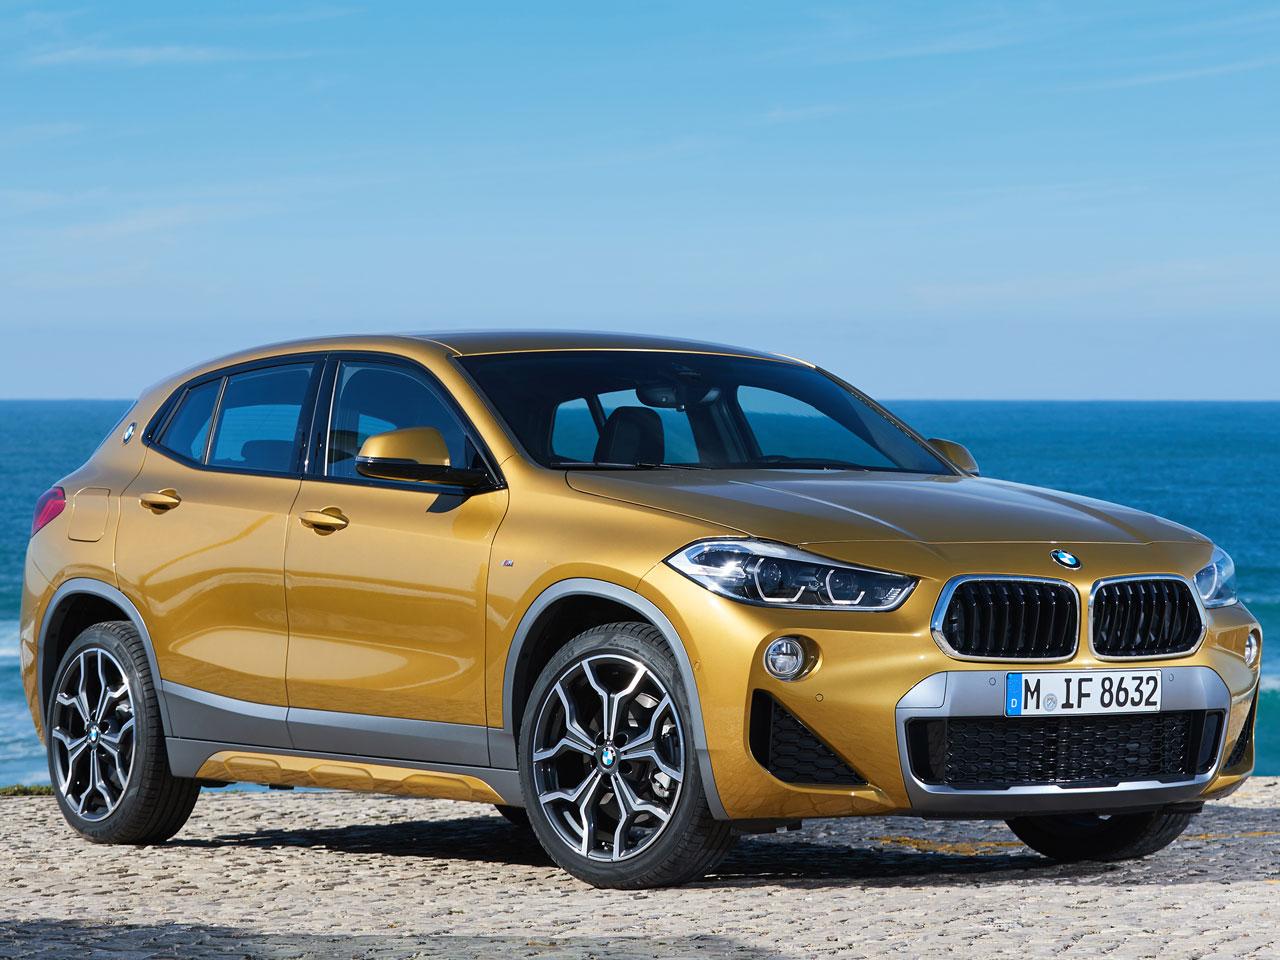 BMW X2 2018年モデル 新車画像